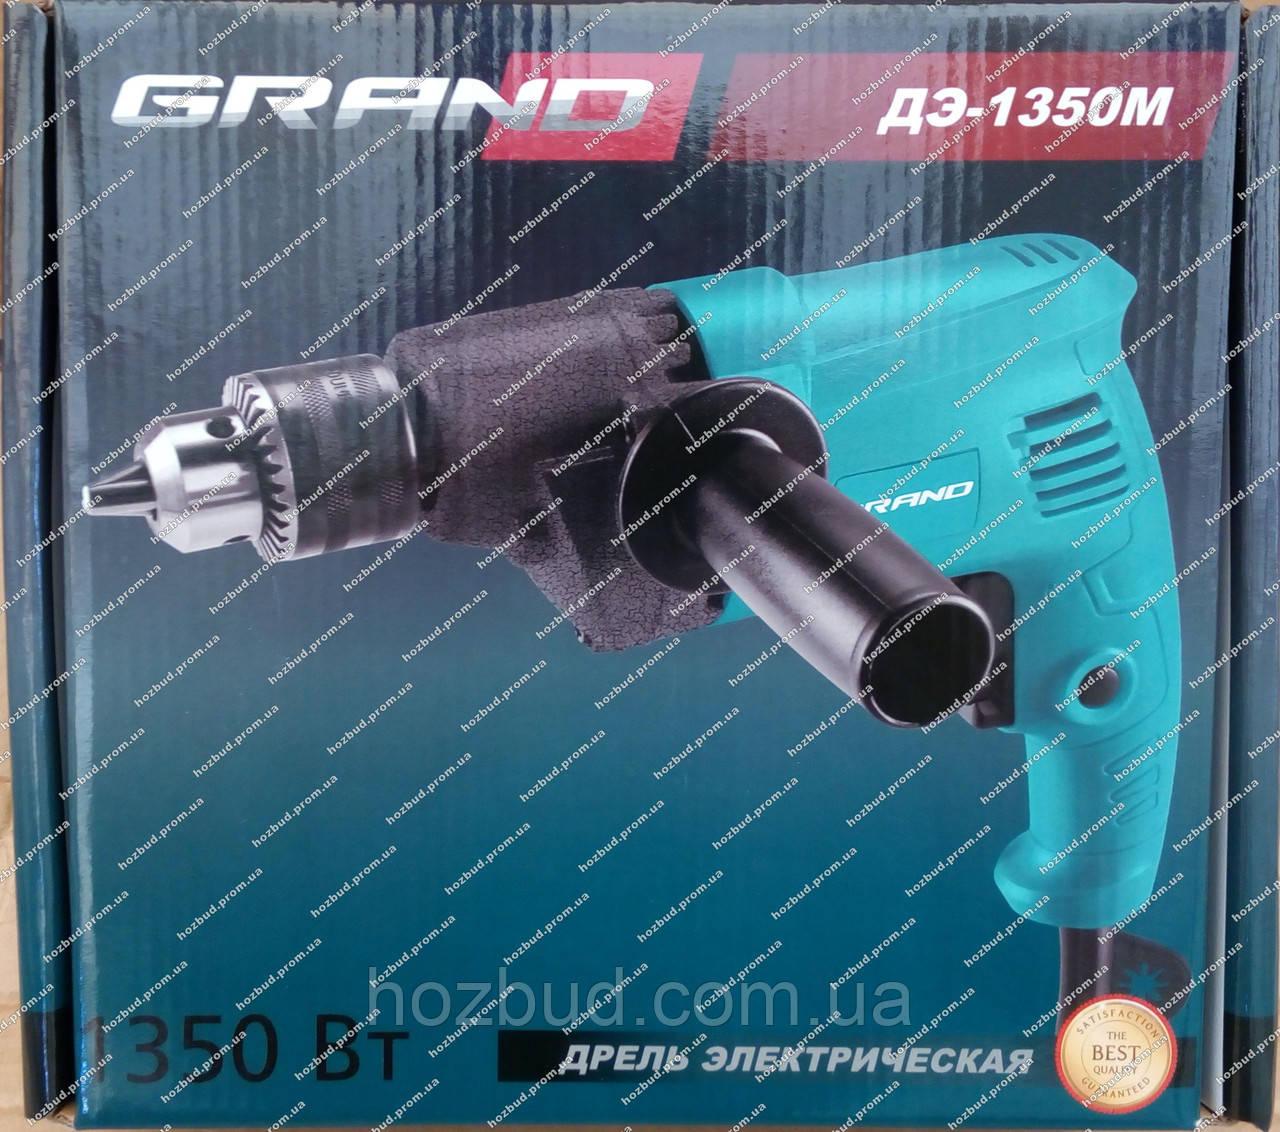 Дрель GRAND ДЭ-1350М